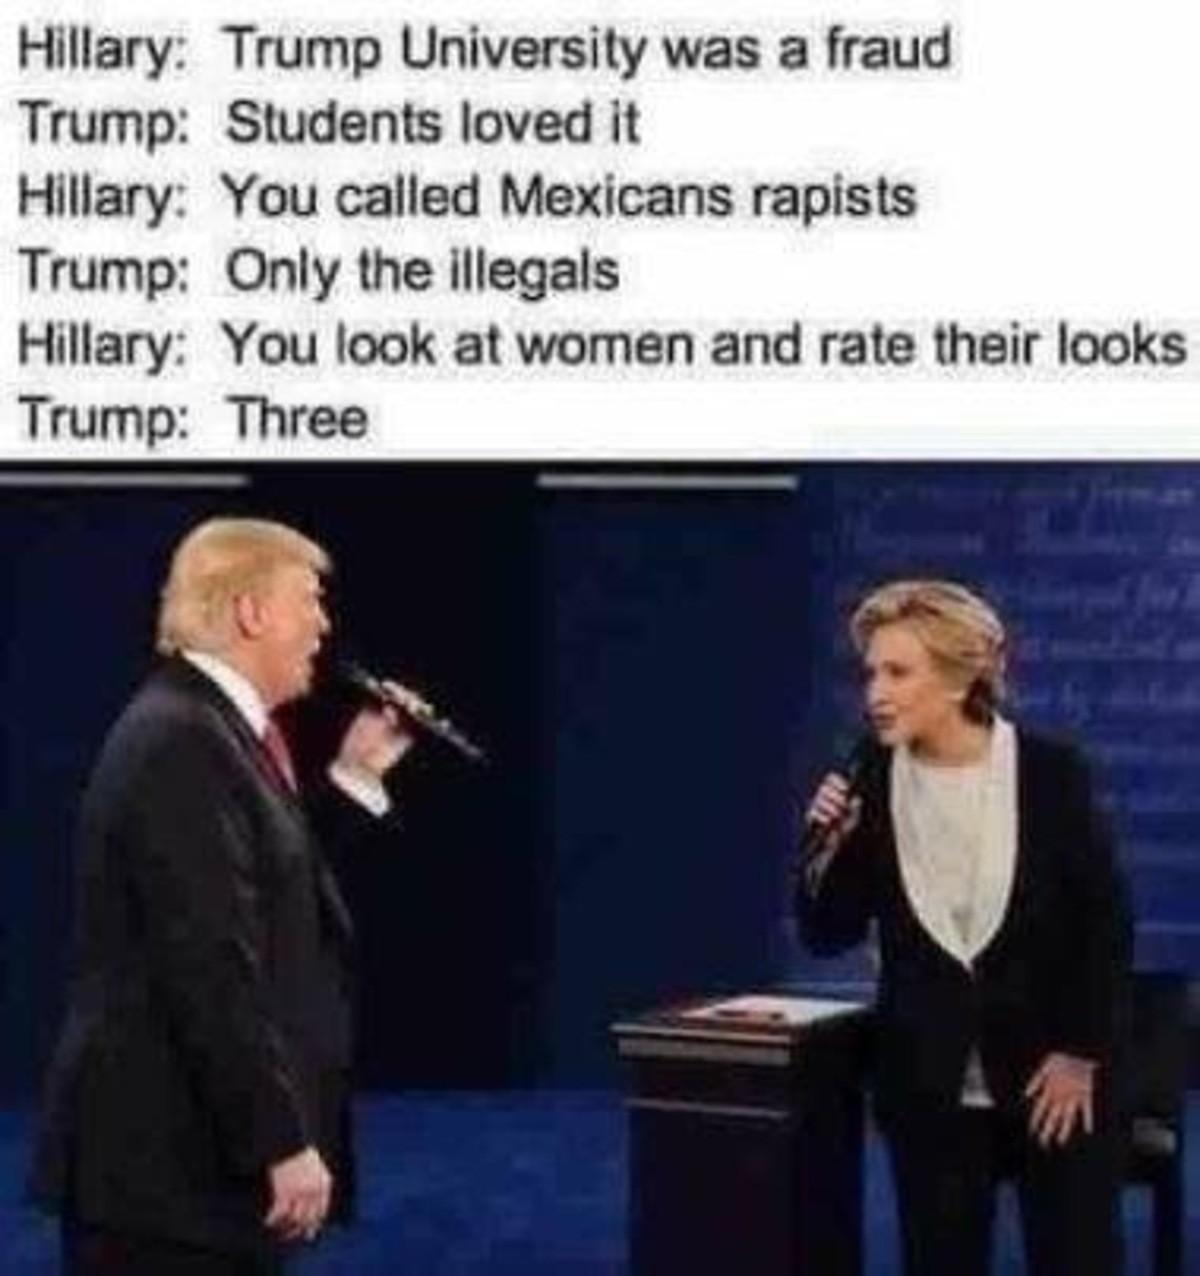 "Trump vs Hillary. . Hillary: '] University 'Cl'"" , ] fraud Trump: '! faiil', F, loved It Hillary: You 'Jill:,',,?),)'], Martians rapists Trump: Only the Illegal Trump vs Hillary Hillary: '] University 'Cl'"" ] fraud Trump: '! faiil' F loved It You 'Jill: ' ?) )'] Martians rapists Only the Illegal"